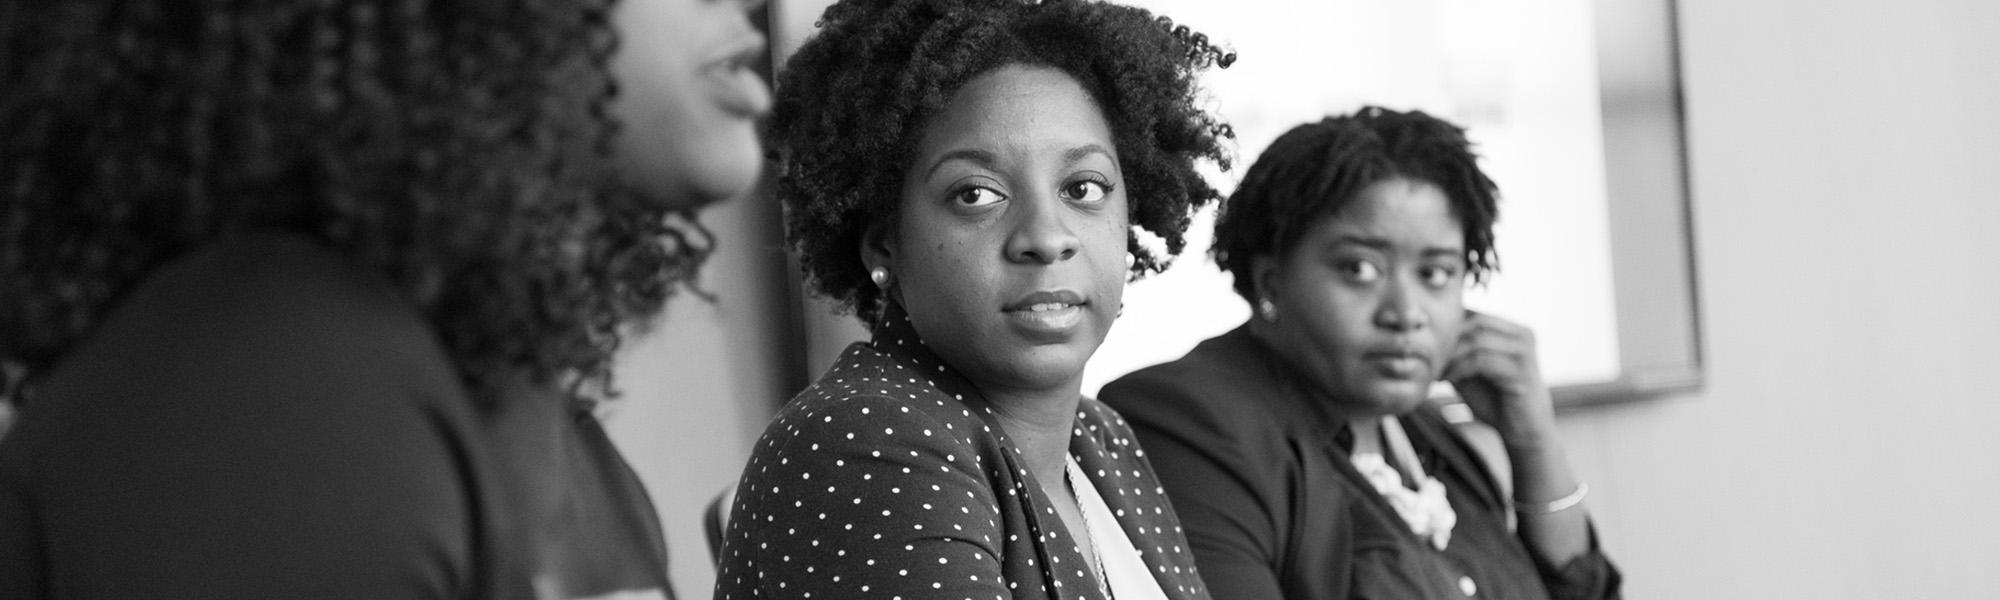 Black women entrepreneurs in a meeting